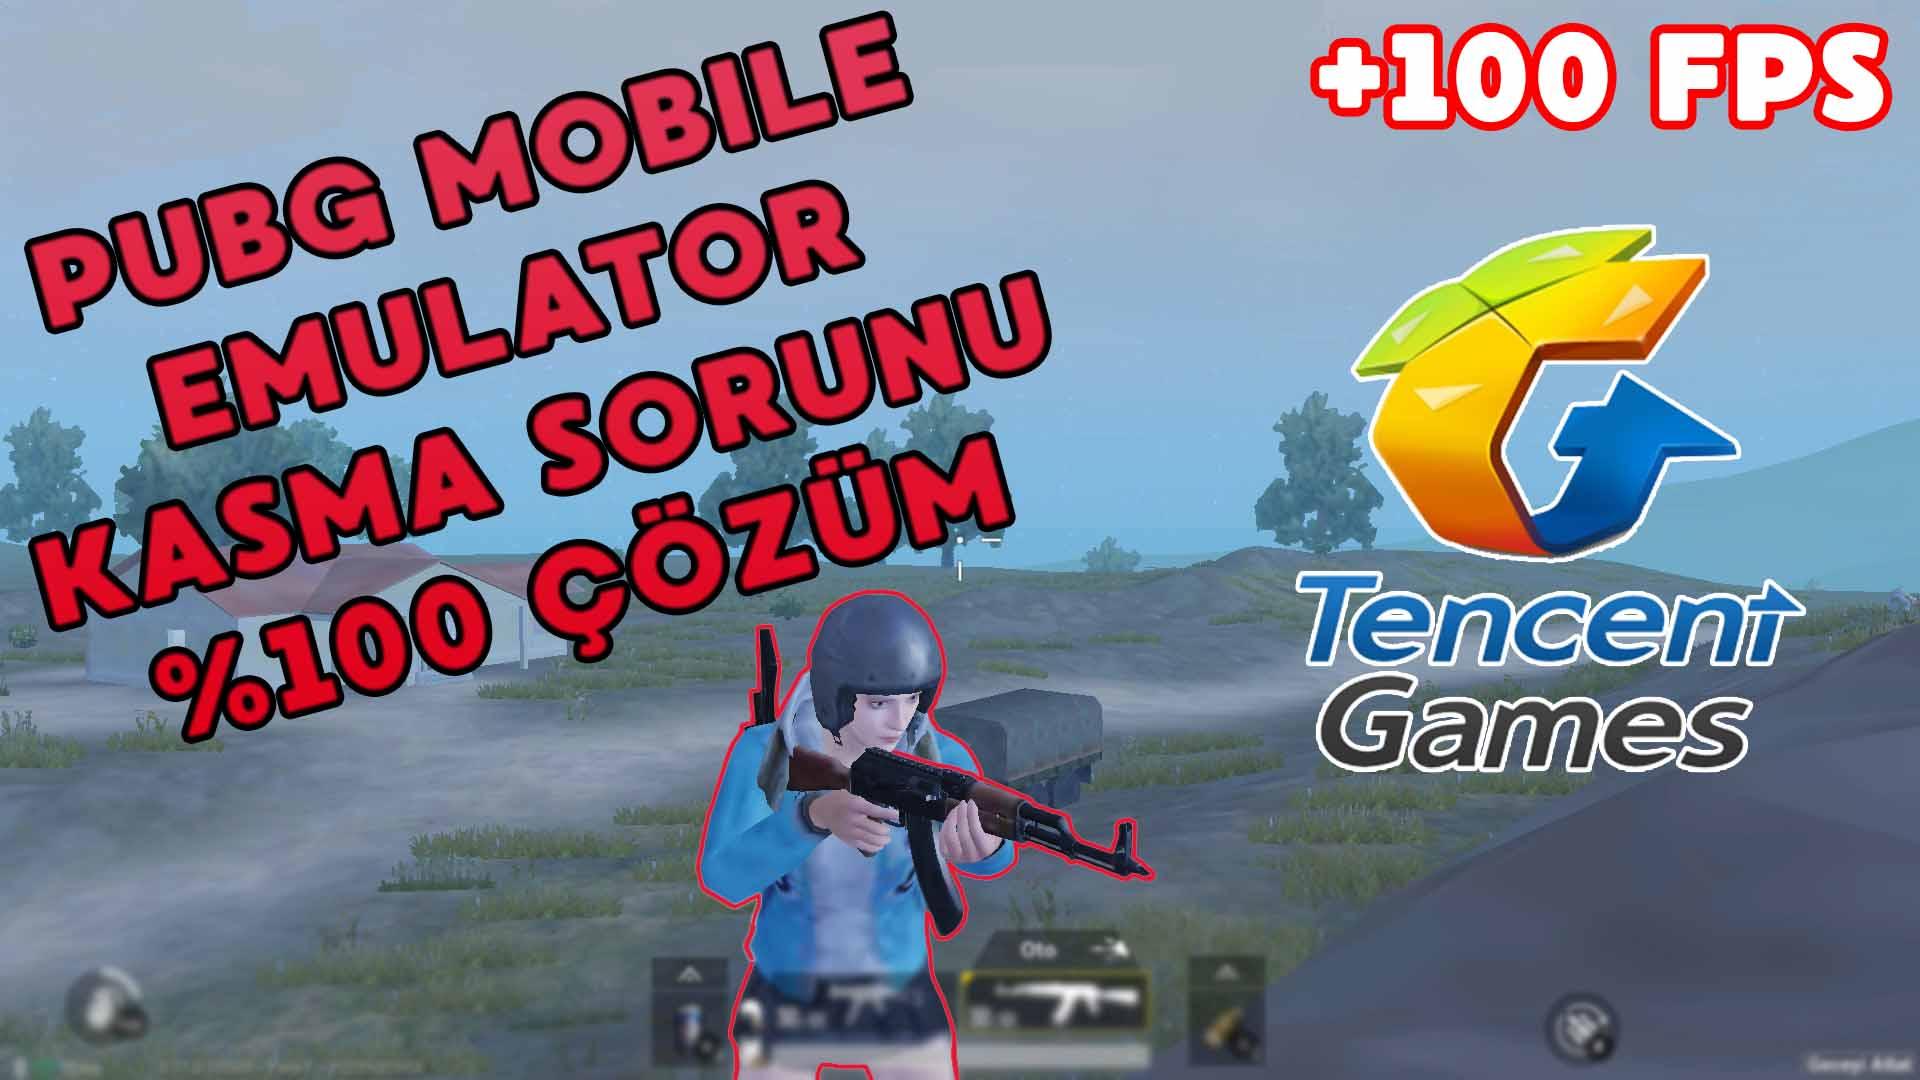 pubg mobile emulator kasma sorunu